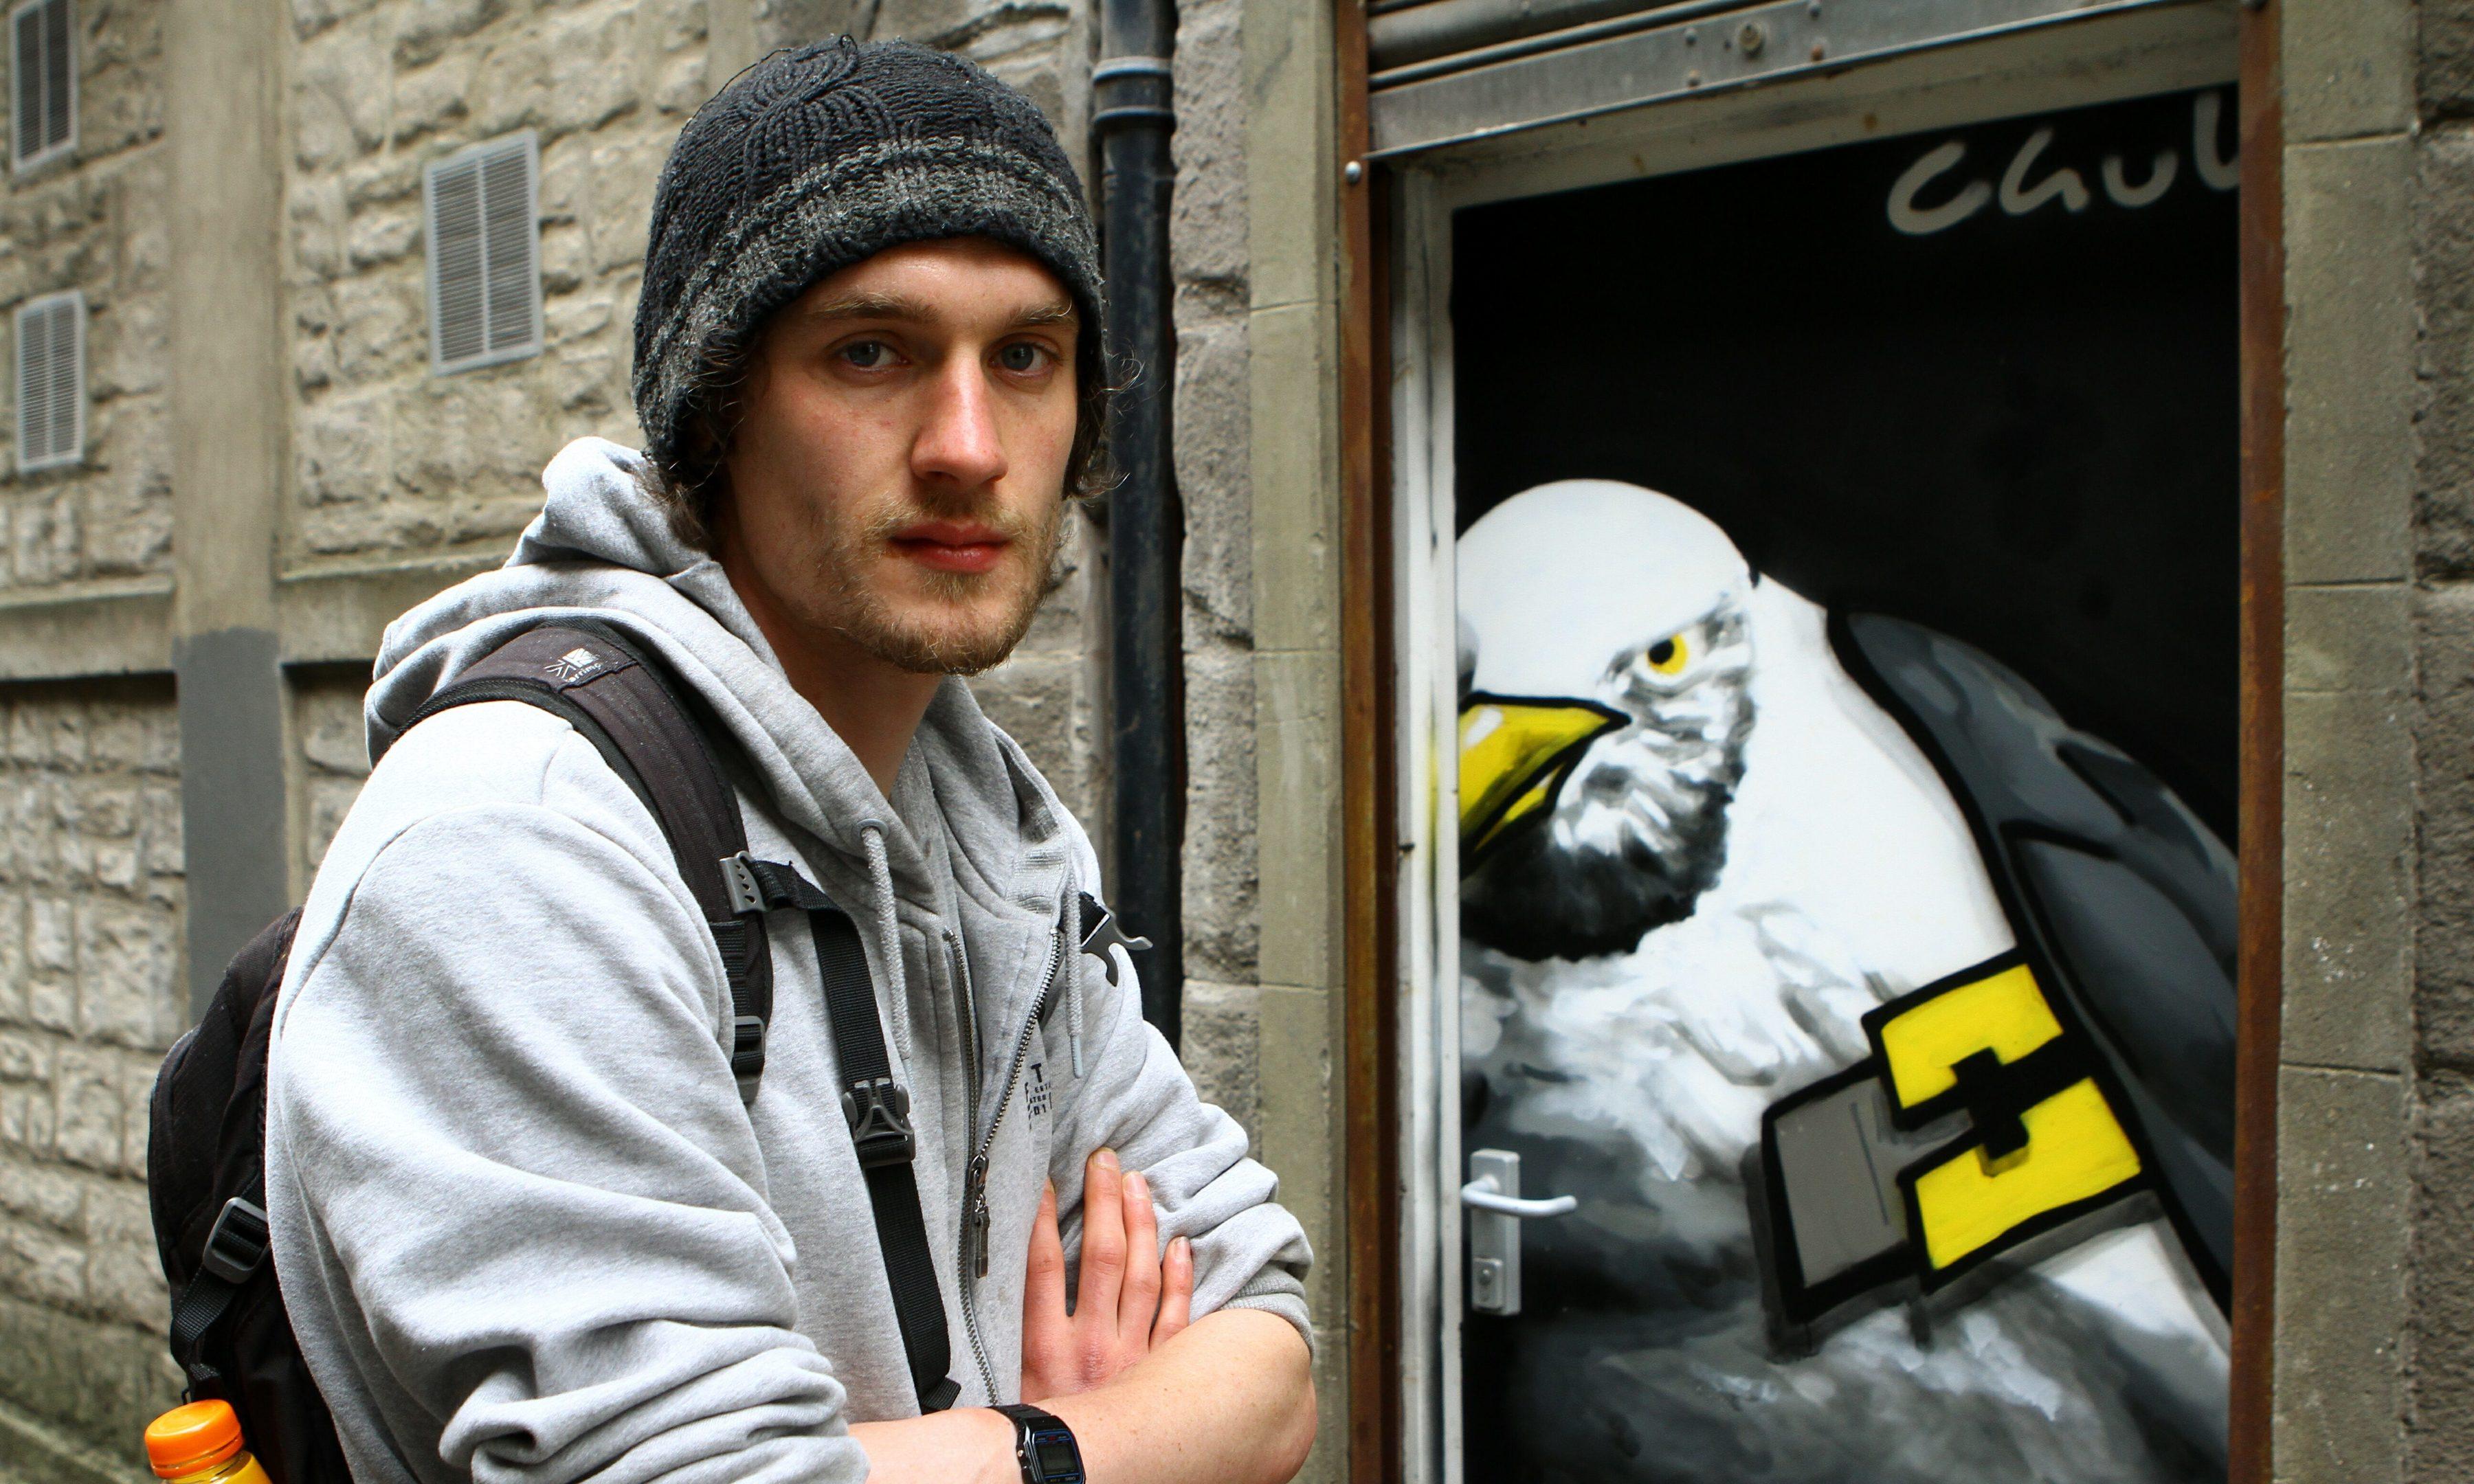 Craig Crawford beside his door in Couttie's Wynd, one of the doors in the 'Unloved Doors' project